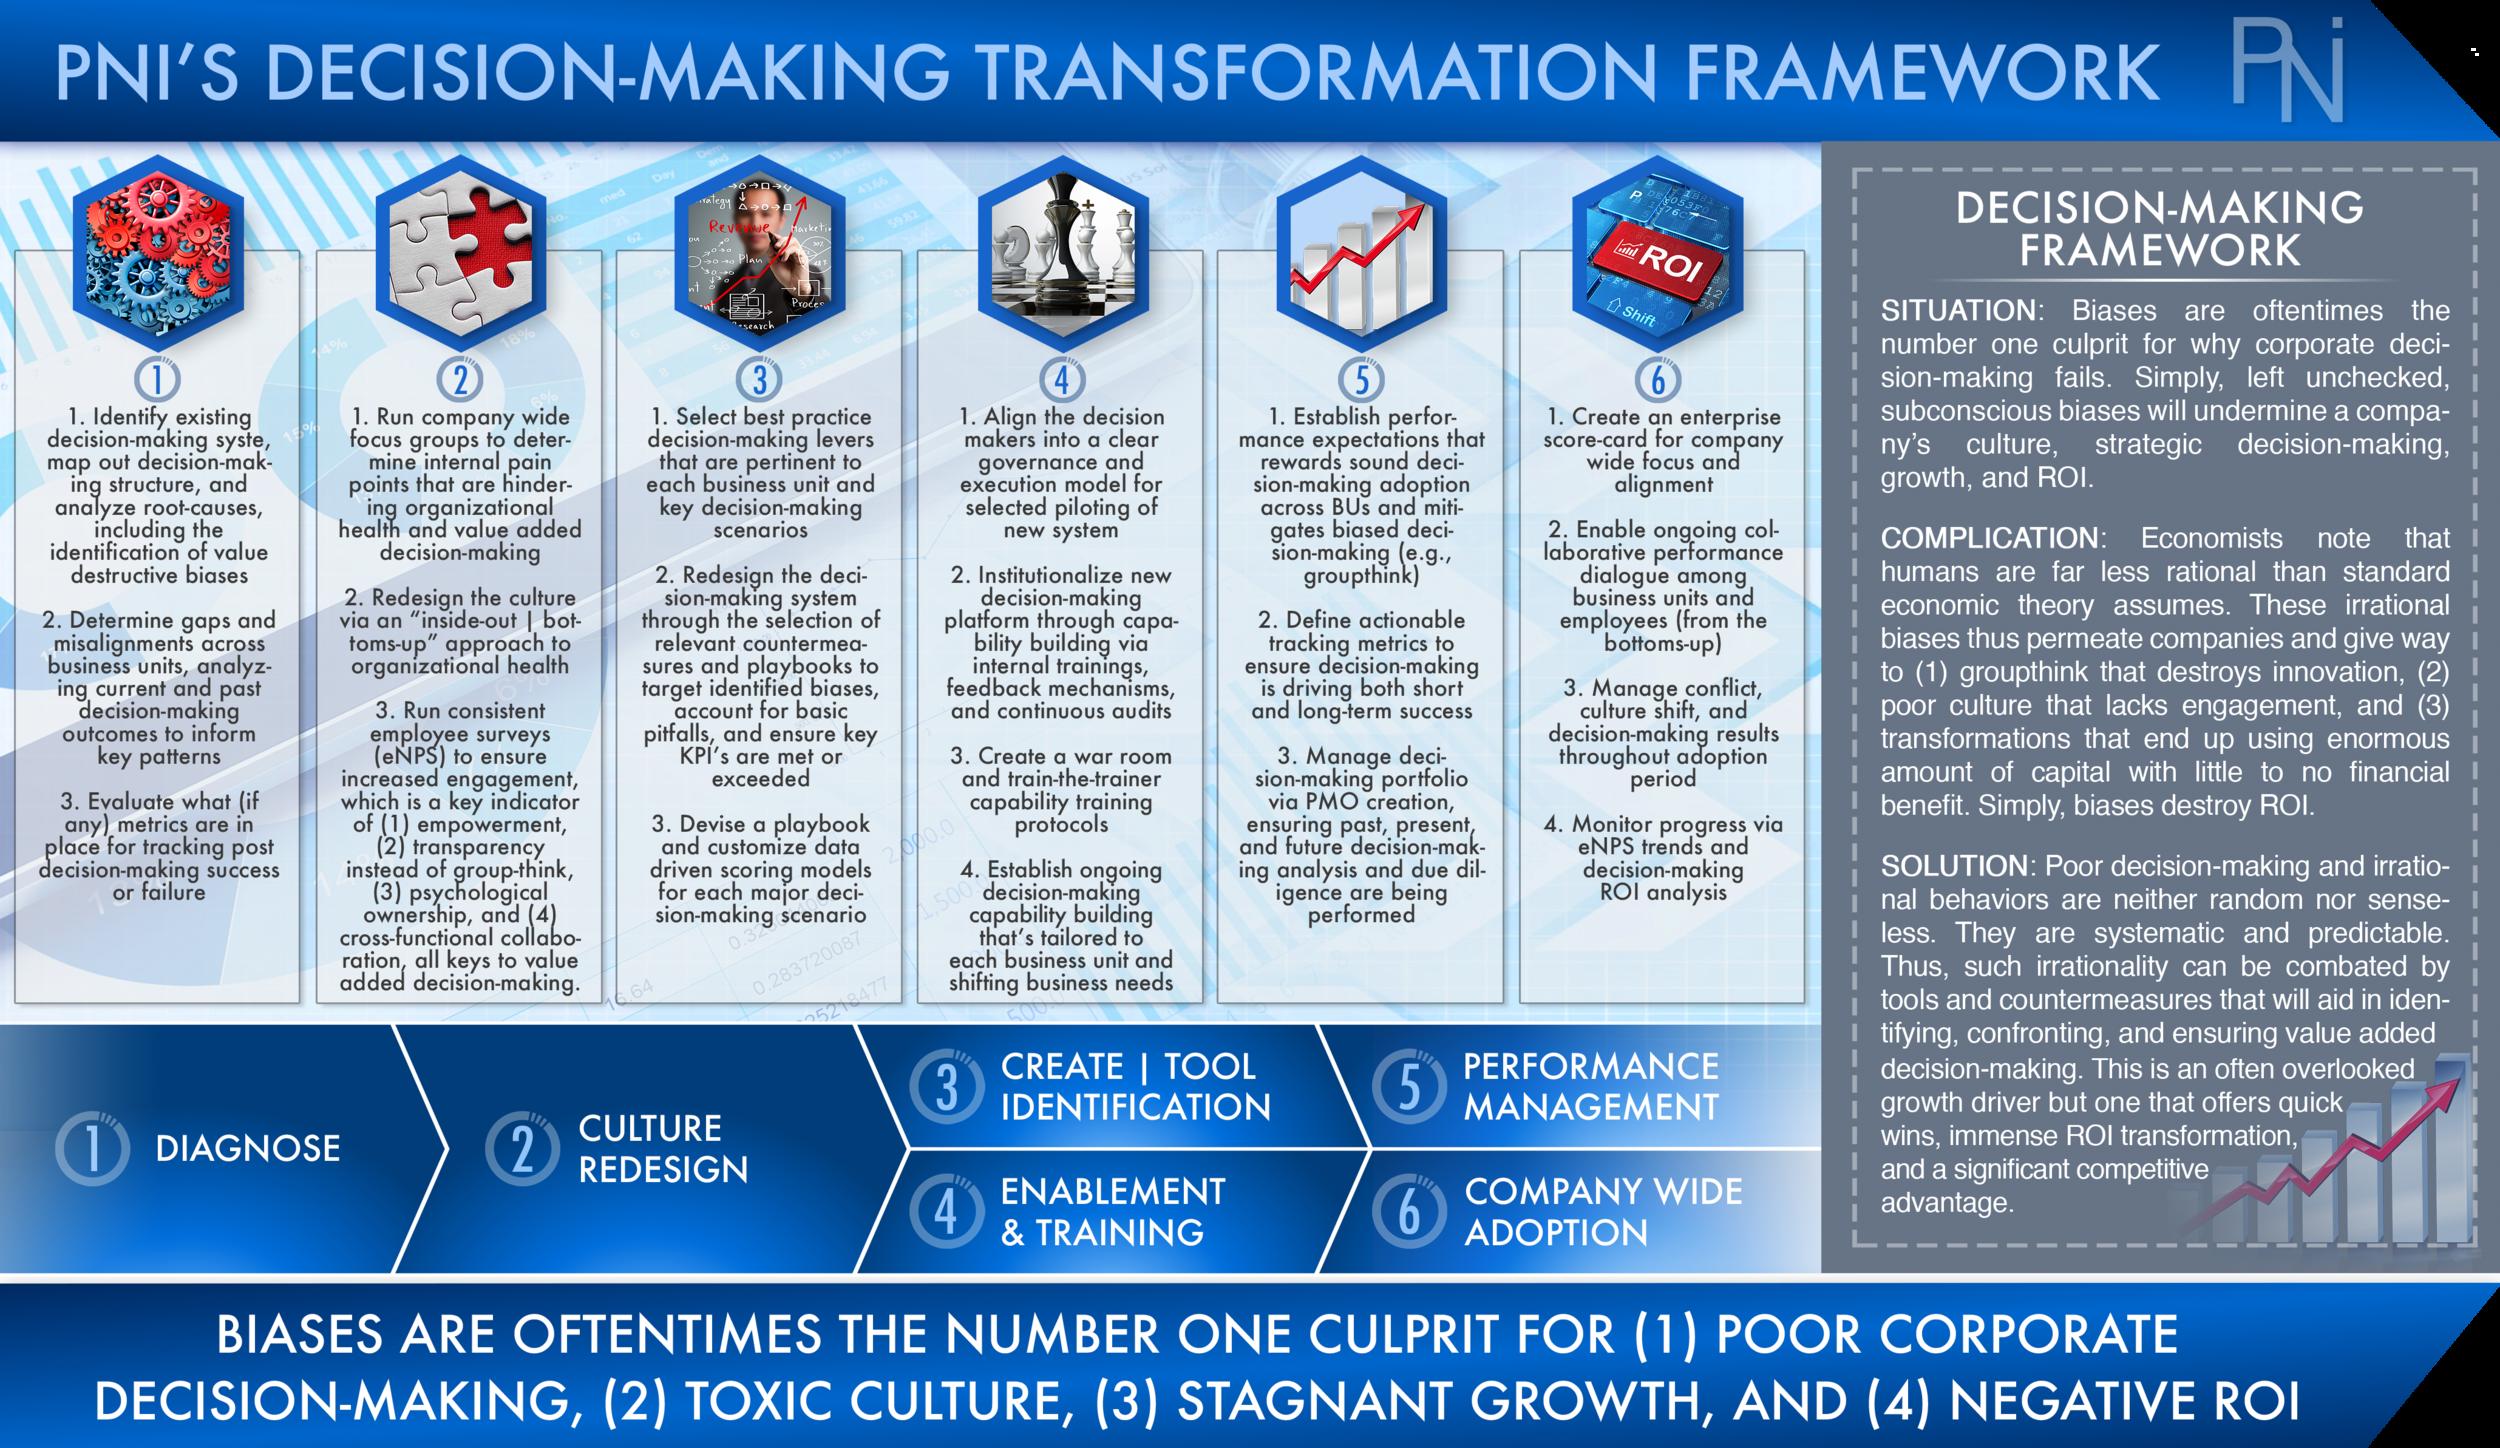 DECISION-MAKING TRANSFORMATION FRAMEWORK  Exhibit 1 (Click to Enlarge)